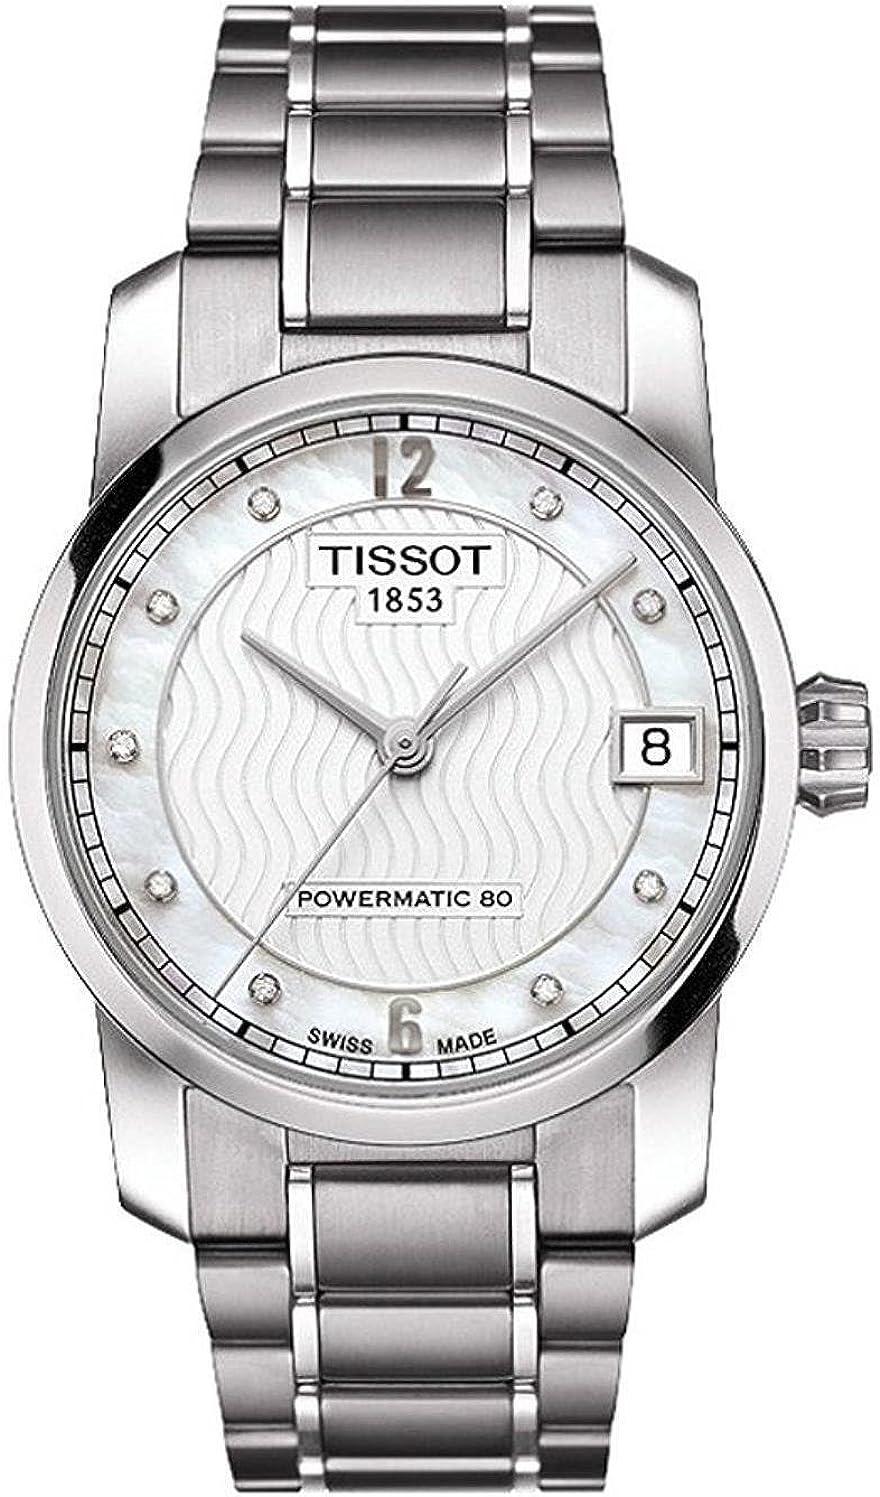 Tissot T0872074411600 - Reloj automático para mujer, esfera de nácar, titanio